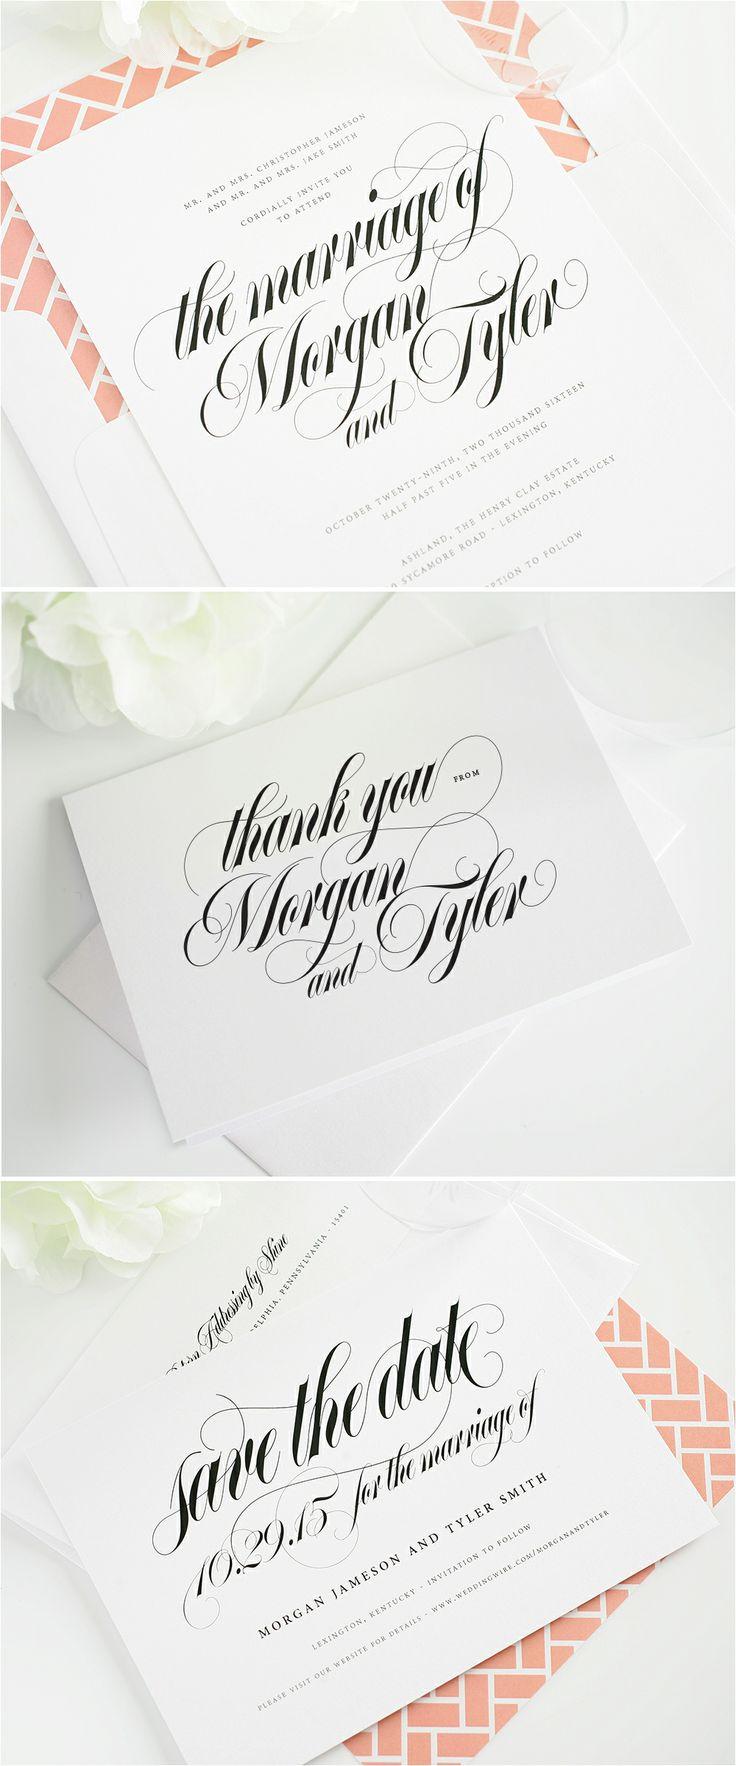 calligraphy names wedding invitations #stationery #calligraphy #invitations #wedding http://www.shineweddinginvitations.com/wedding-invitations/calligraphy-names-wedding-invitations